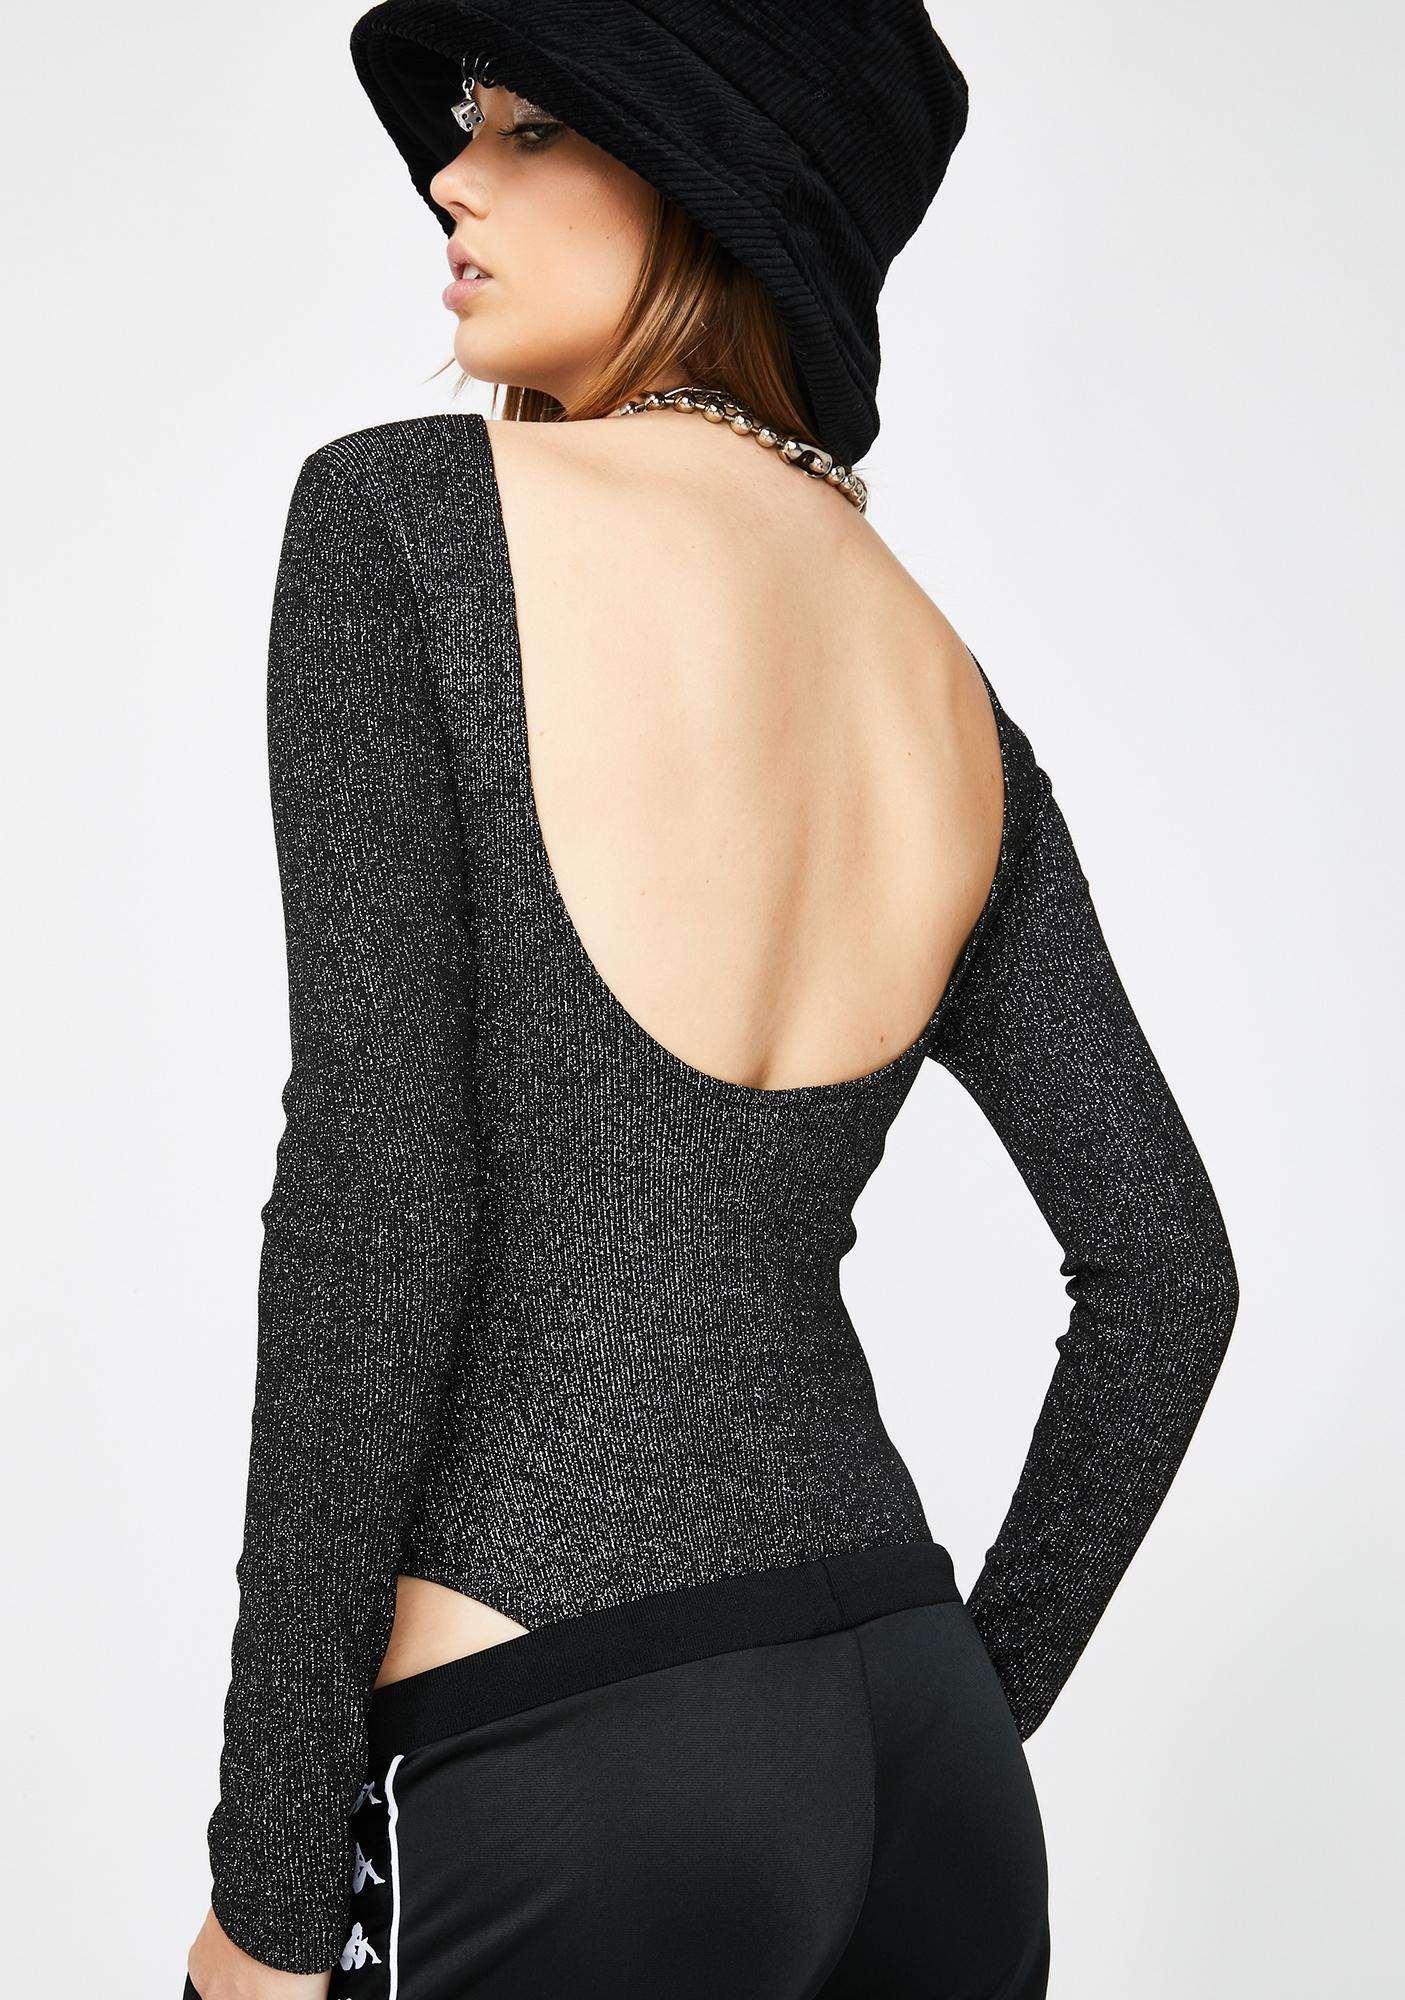 Kappa Authentic JPN Balina Bodysuit